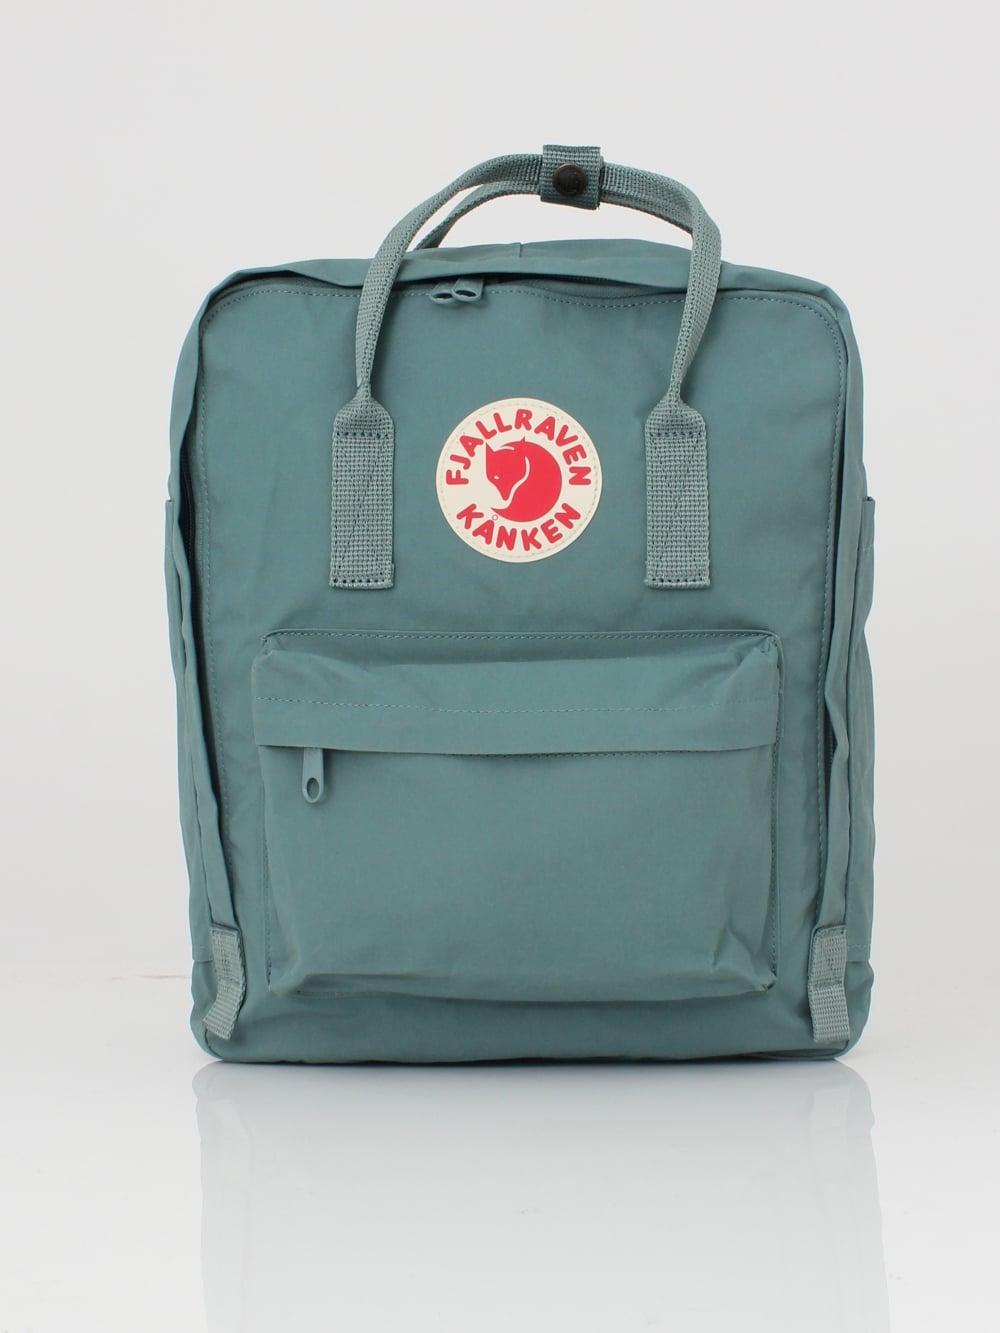 409860190a Fjallraven Kanken Bag in Frost - Northern Threads